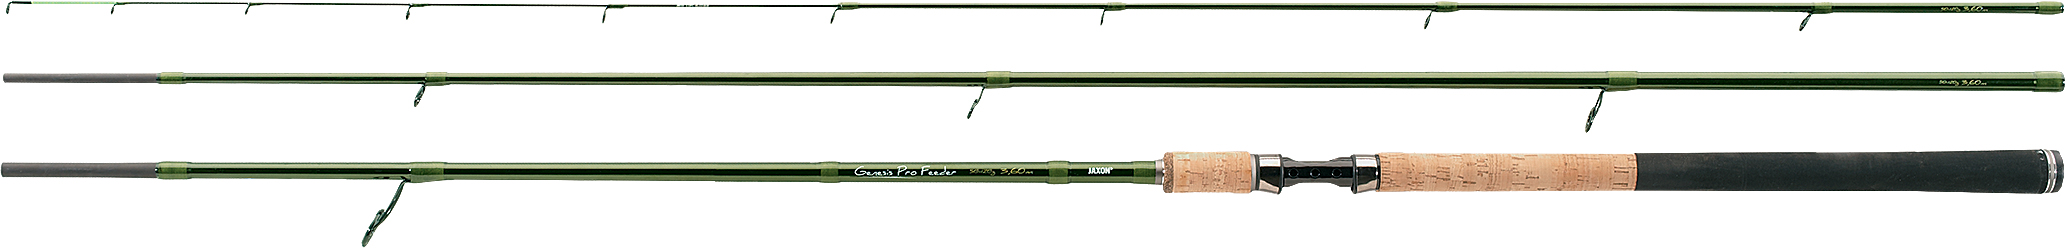 Jaxon Prut Genesis Pro Feeder 3,6m 50-120g